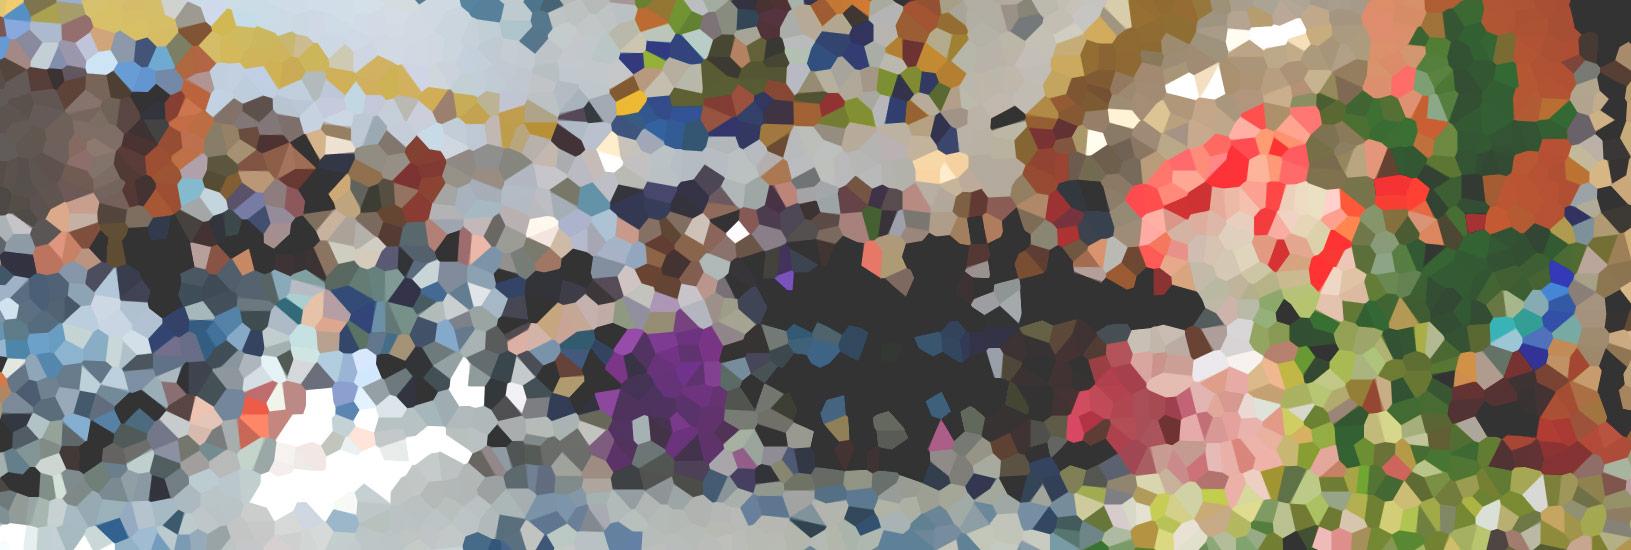 banner-service-mosaic